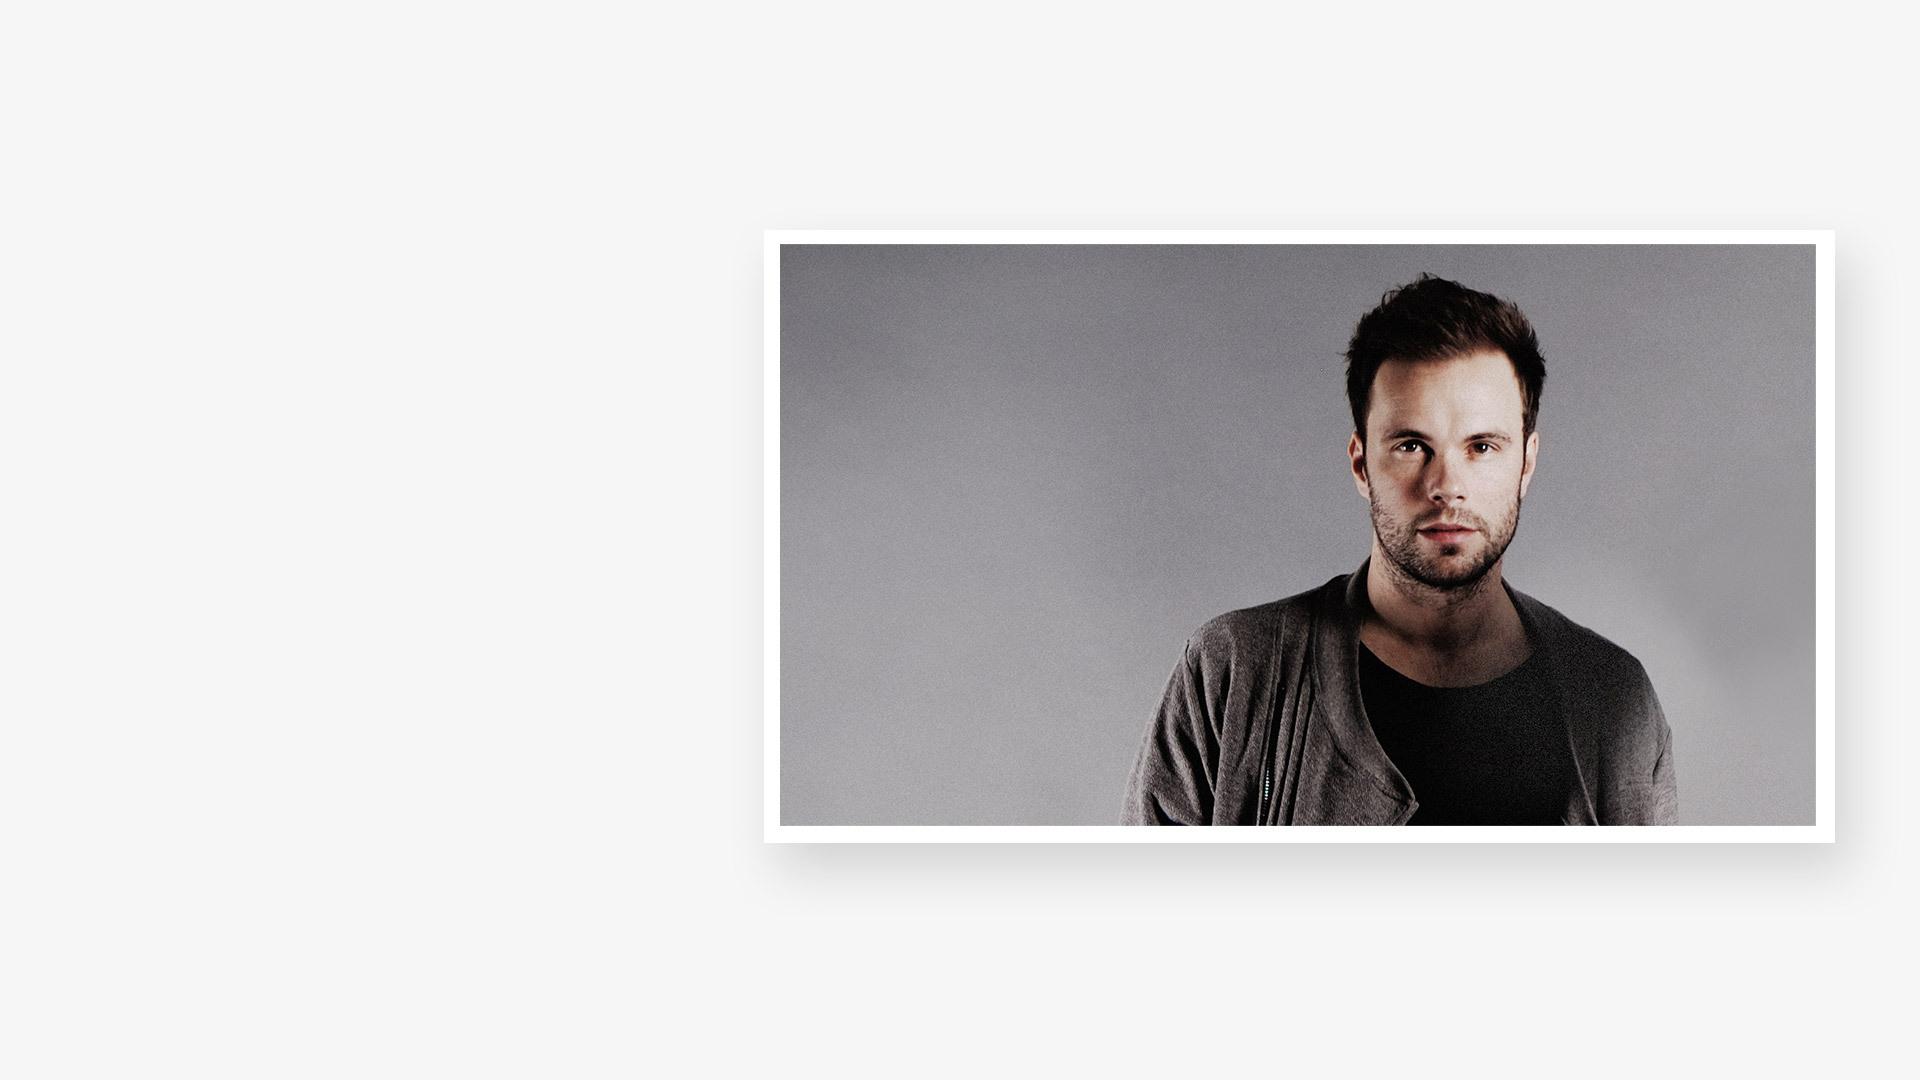 Markus Johansson<br/>瑞典新锐设计师